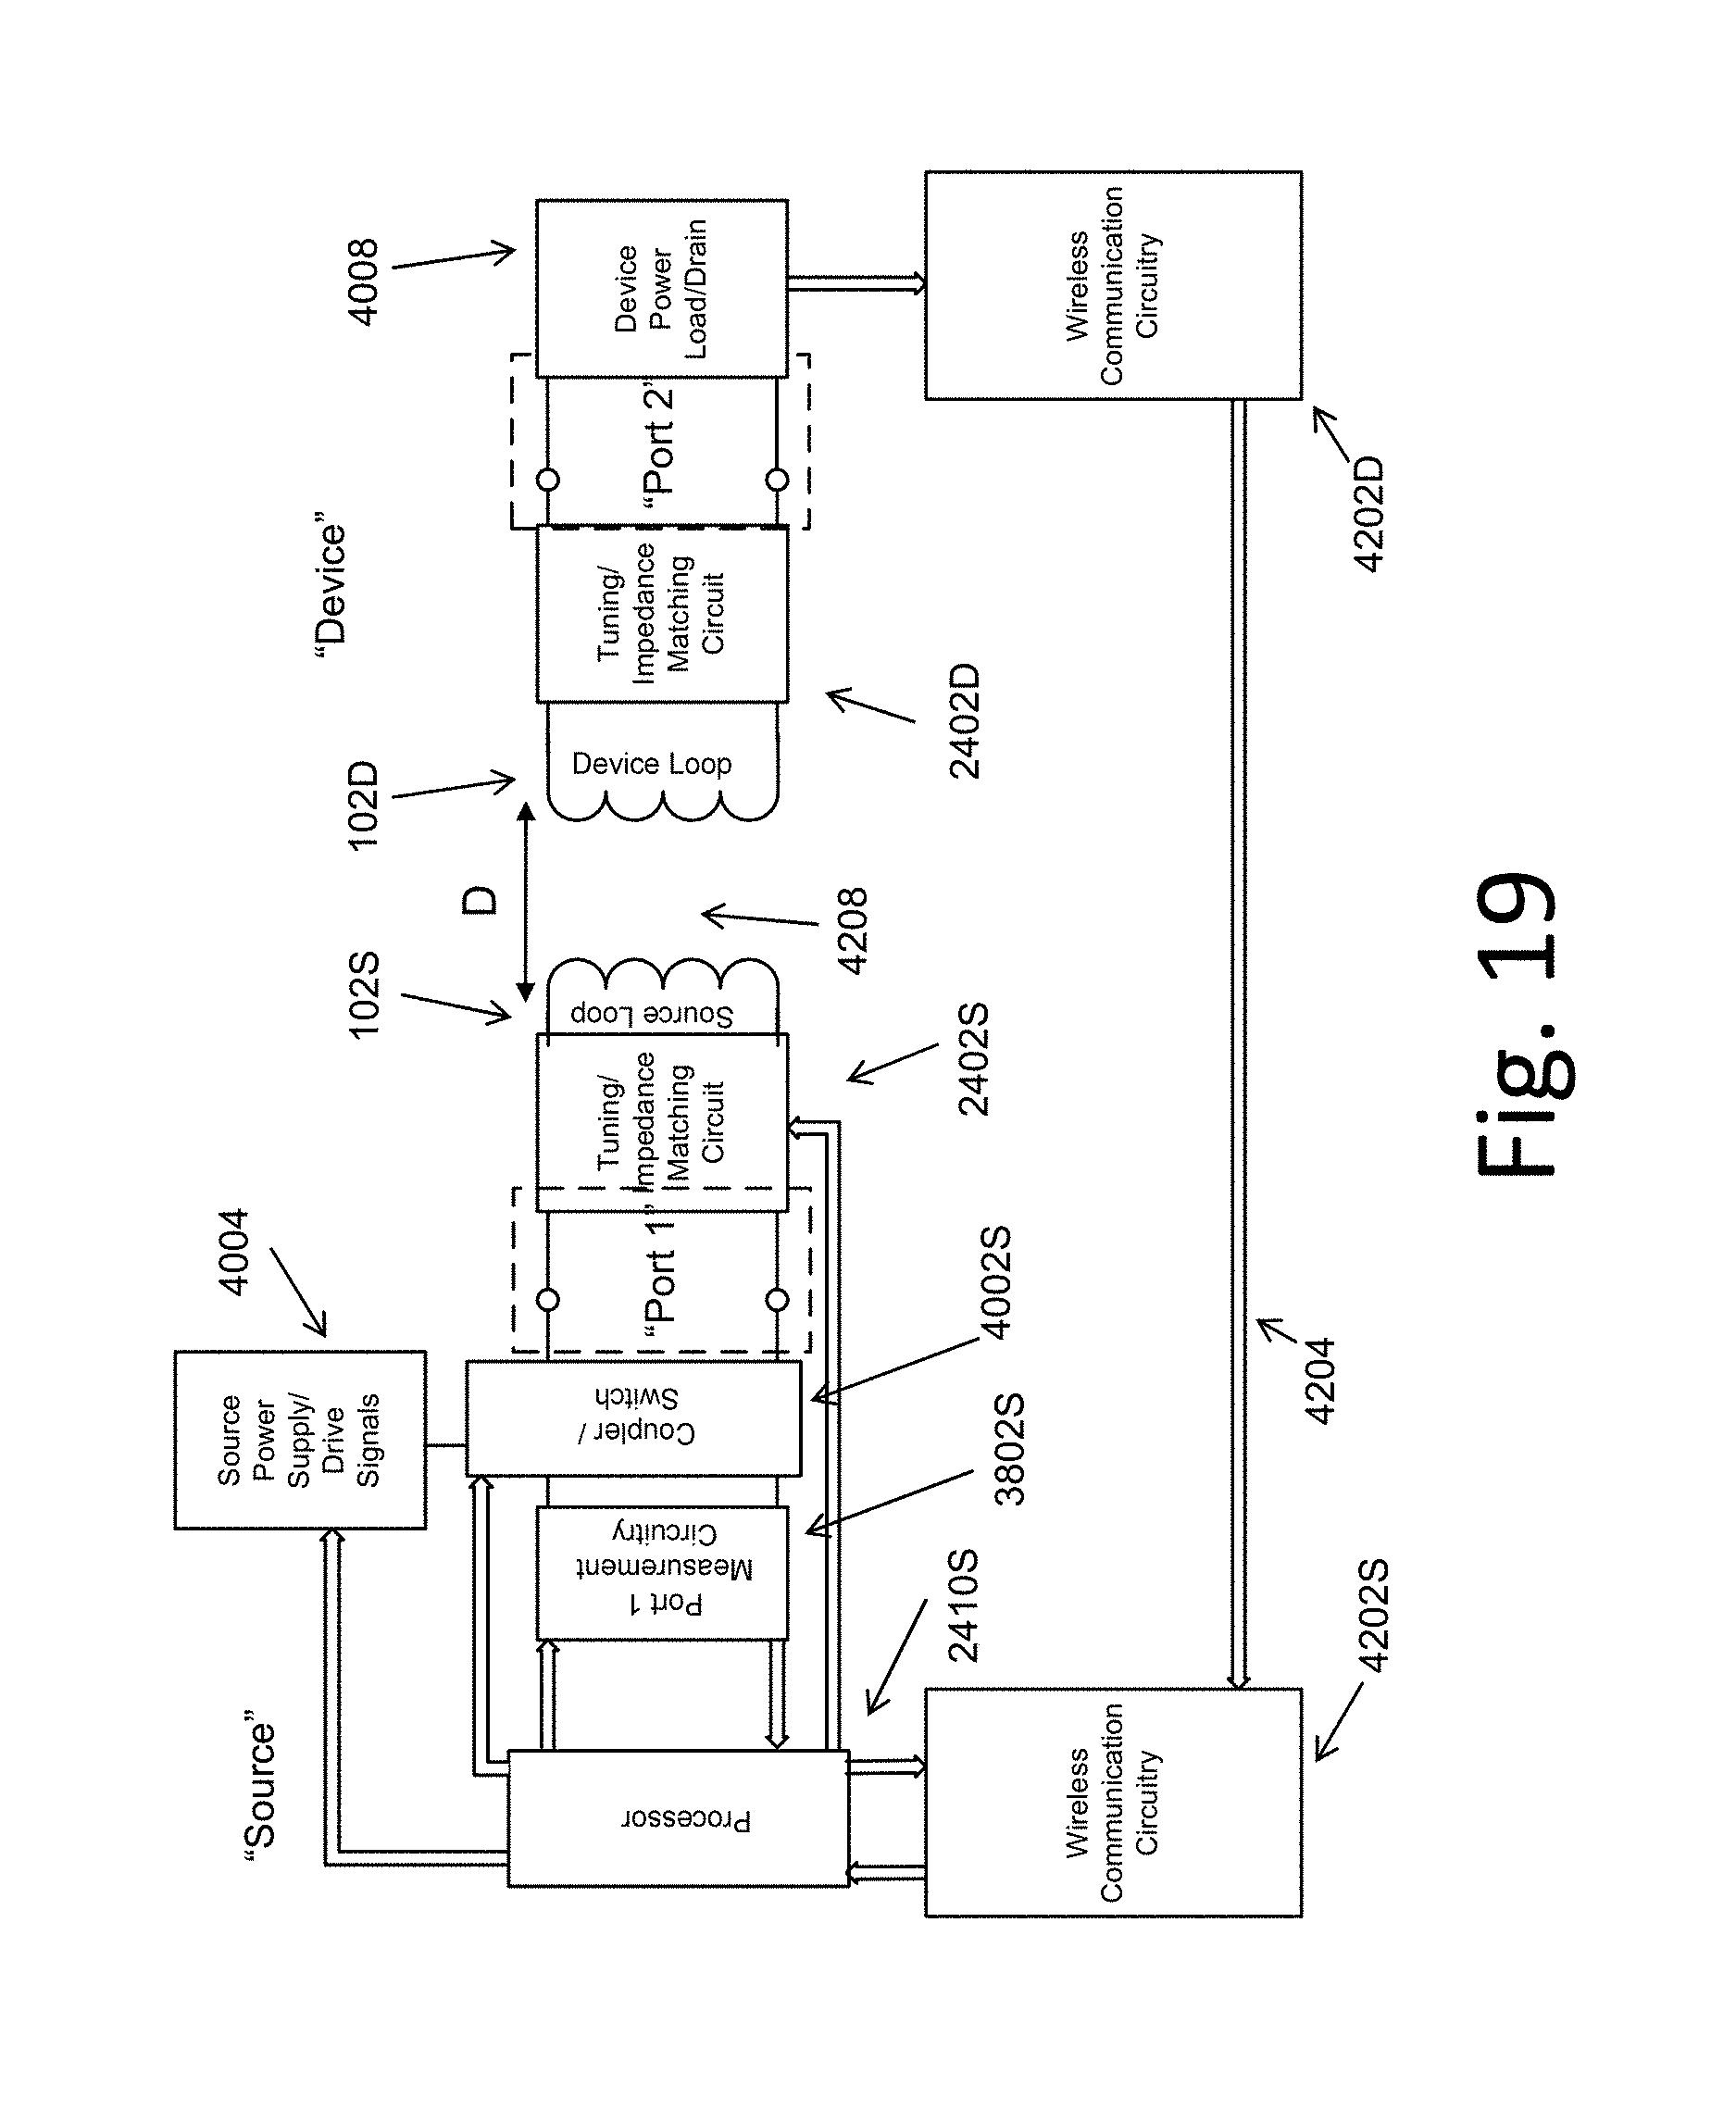 patent us 9 744 858 b2 Toyota Corolla Wiring Diagram patent images